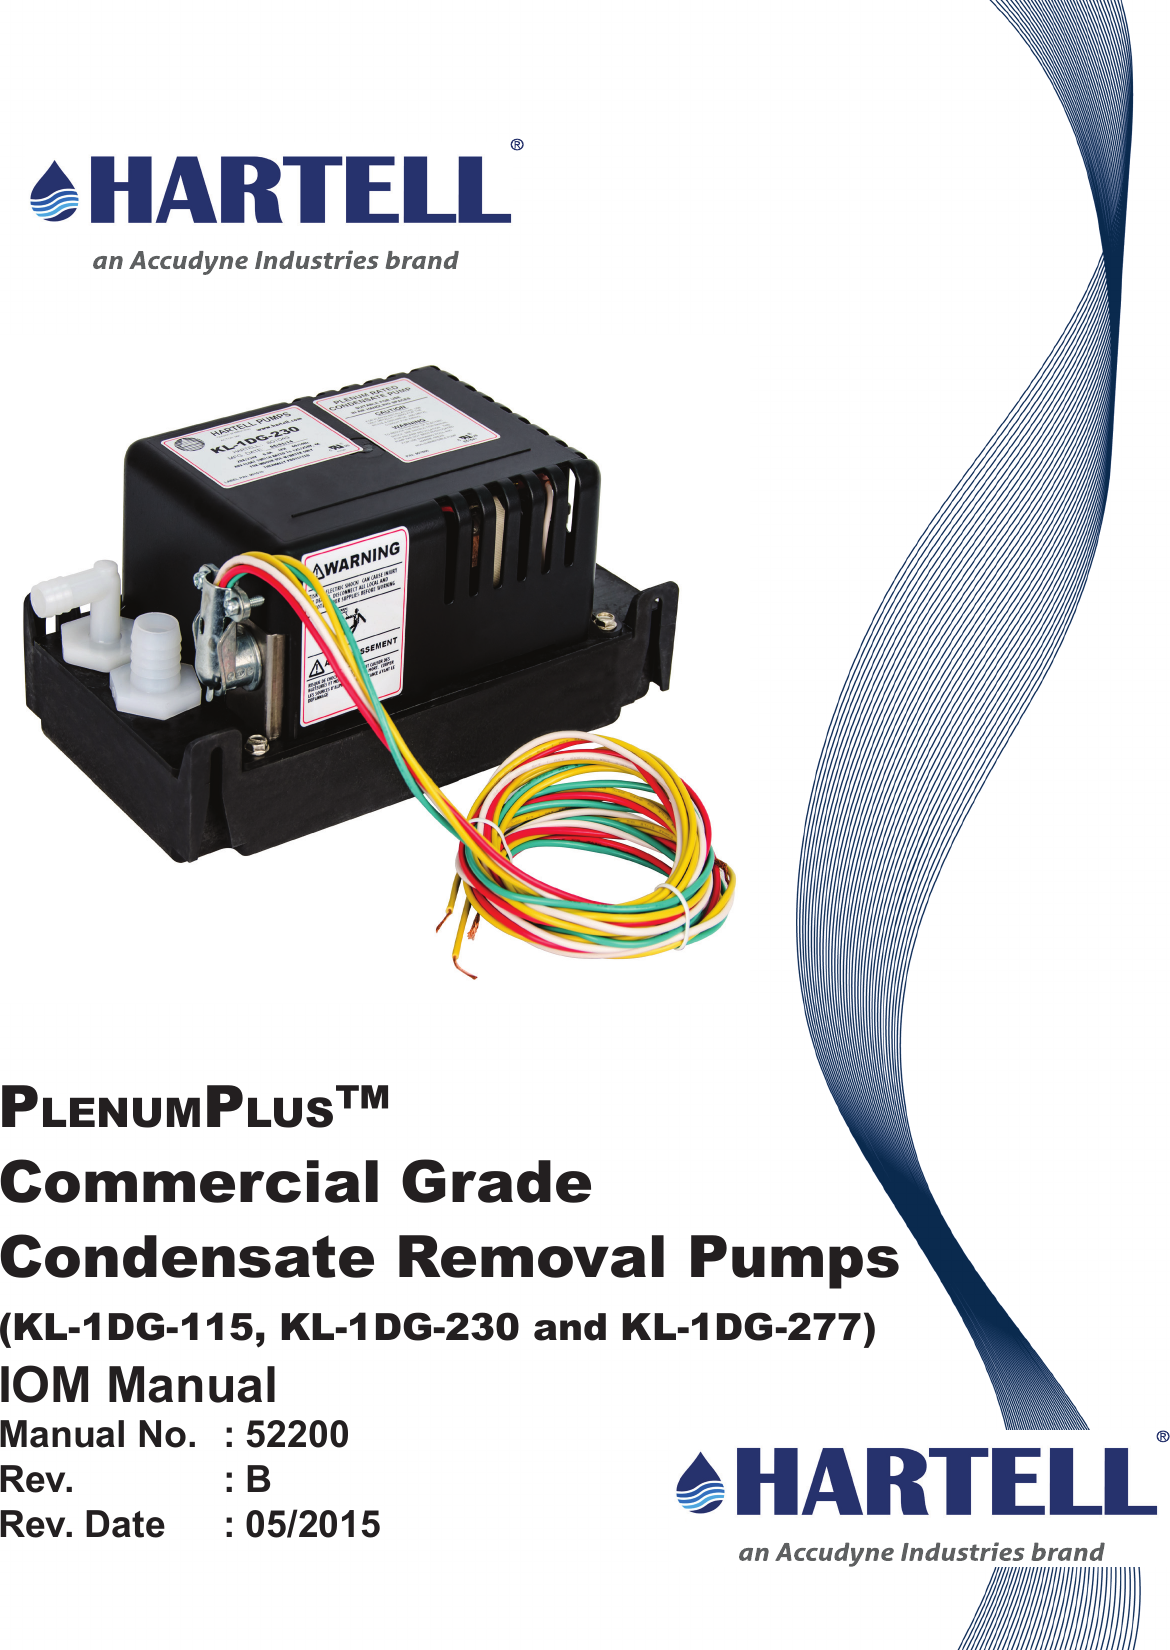 hartell condensate pump wiring diagram 539741 2 hartell kl 1dg condensate removal pump manual  hartell kl 1dg condensate removal pump